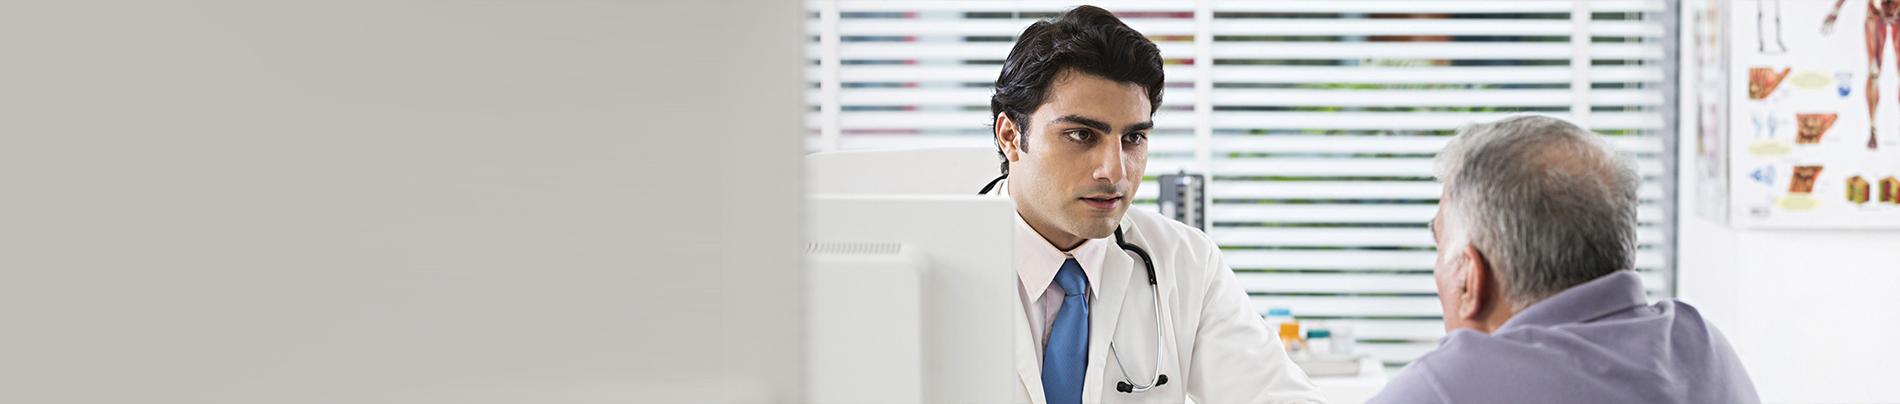 Best Internal Medicine Hospital in Delhi NCR, India